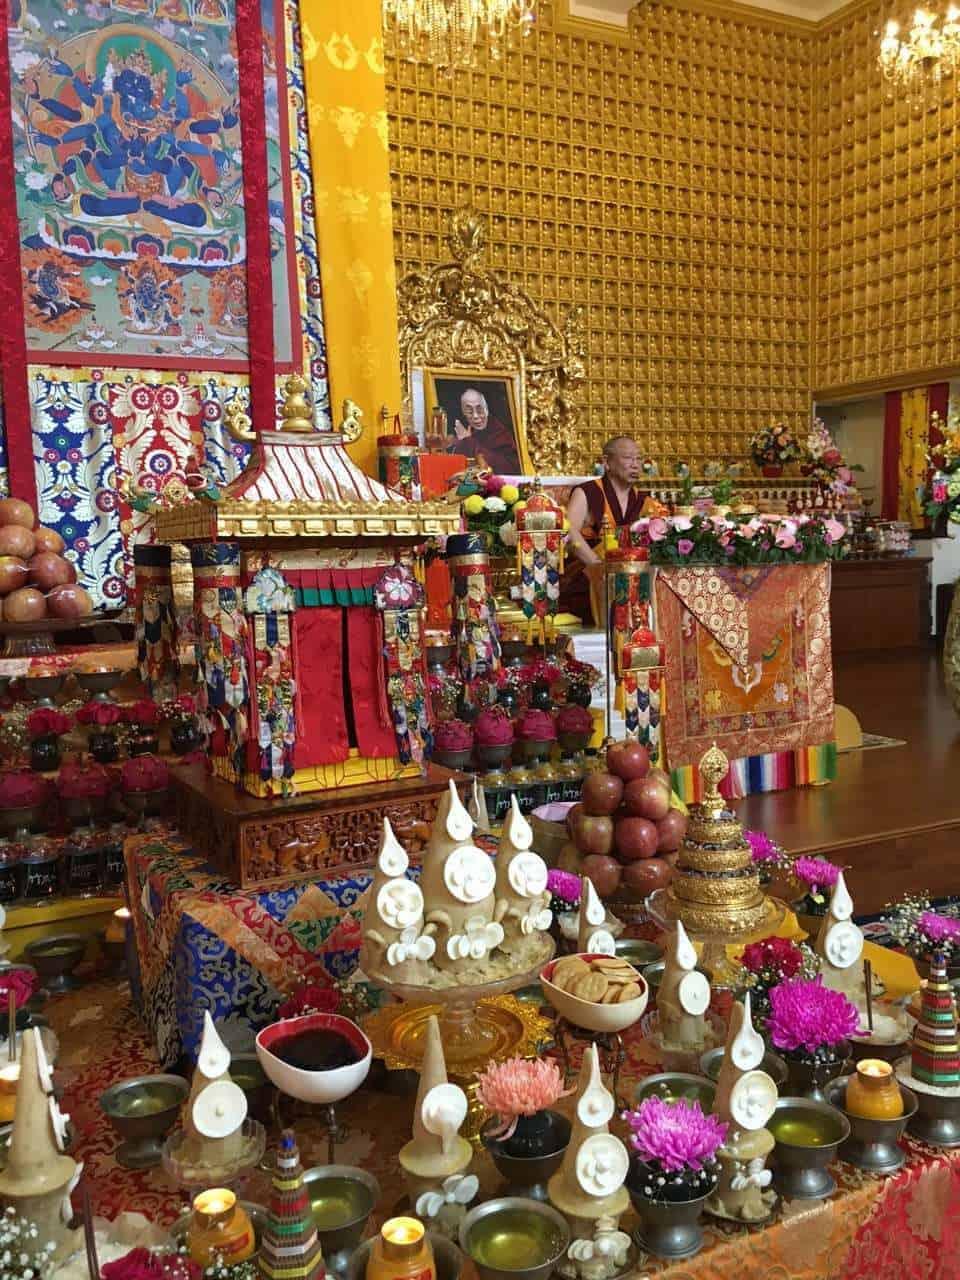 gosok-rinpoche-2016-07-21a819ccdb1ca639cb4c16083cdff52